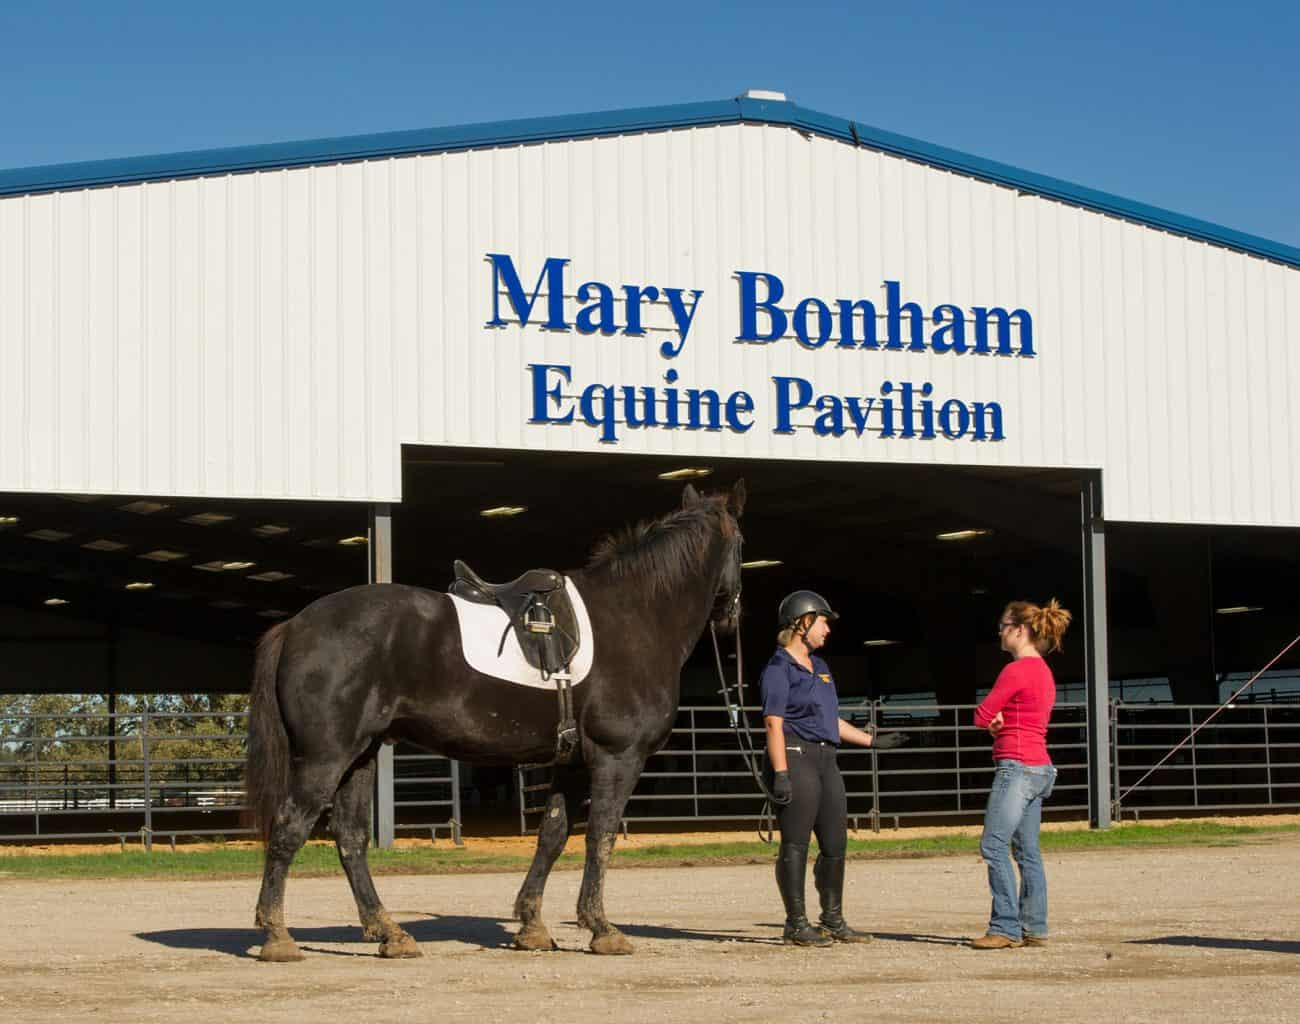 Mary Bonham Equine Pavilion